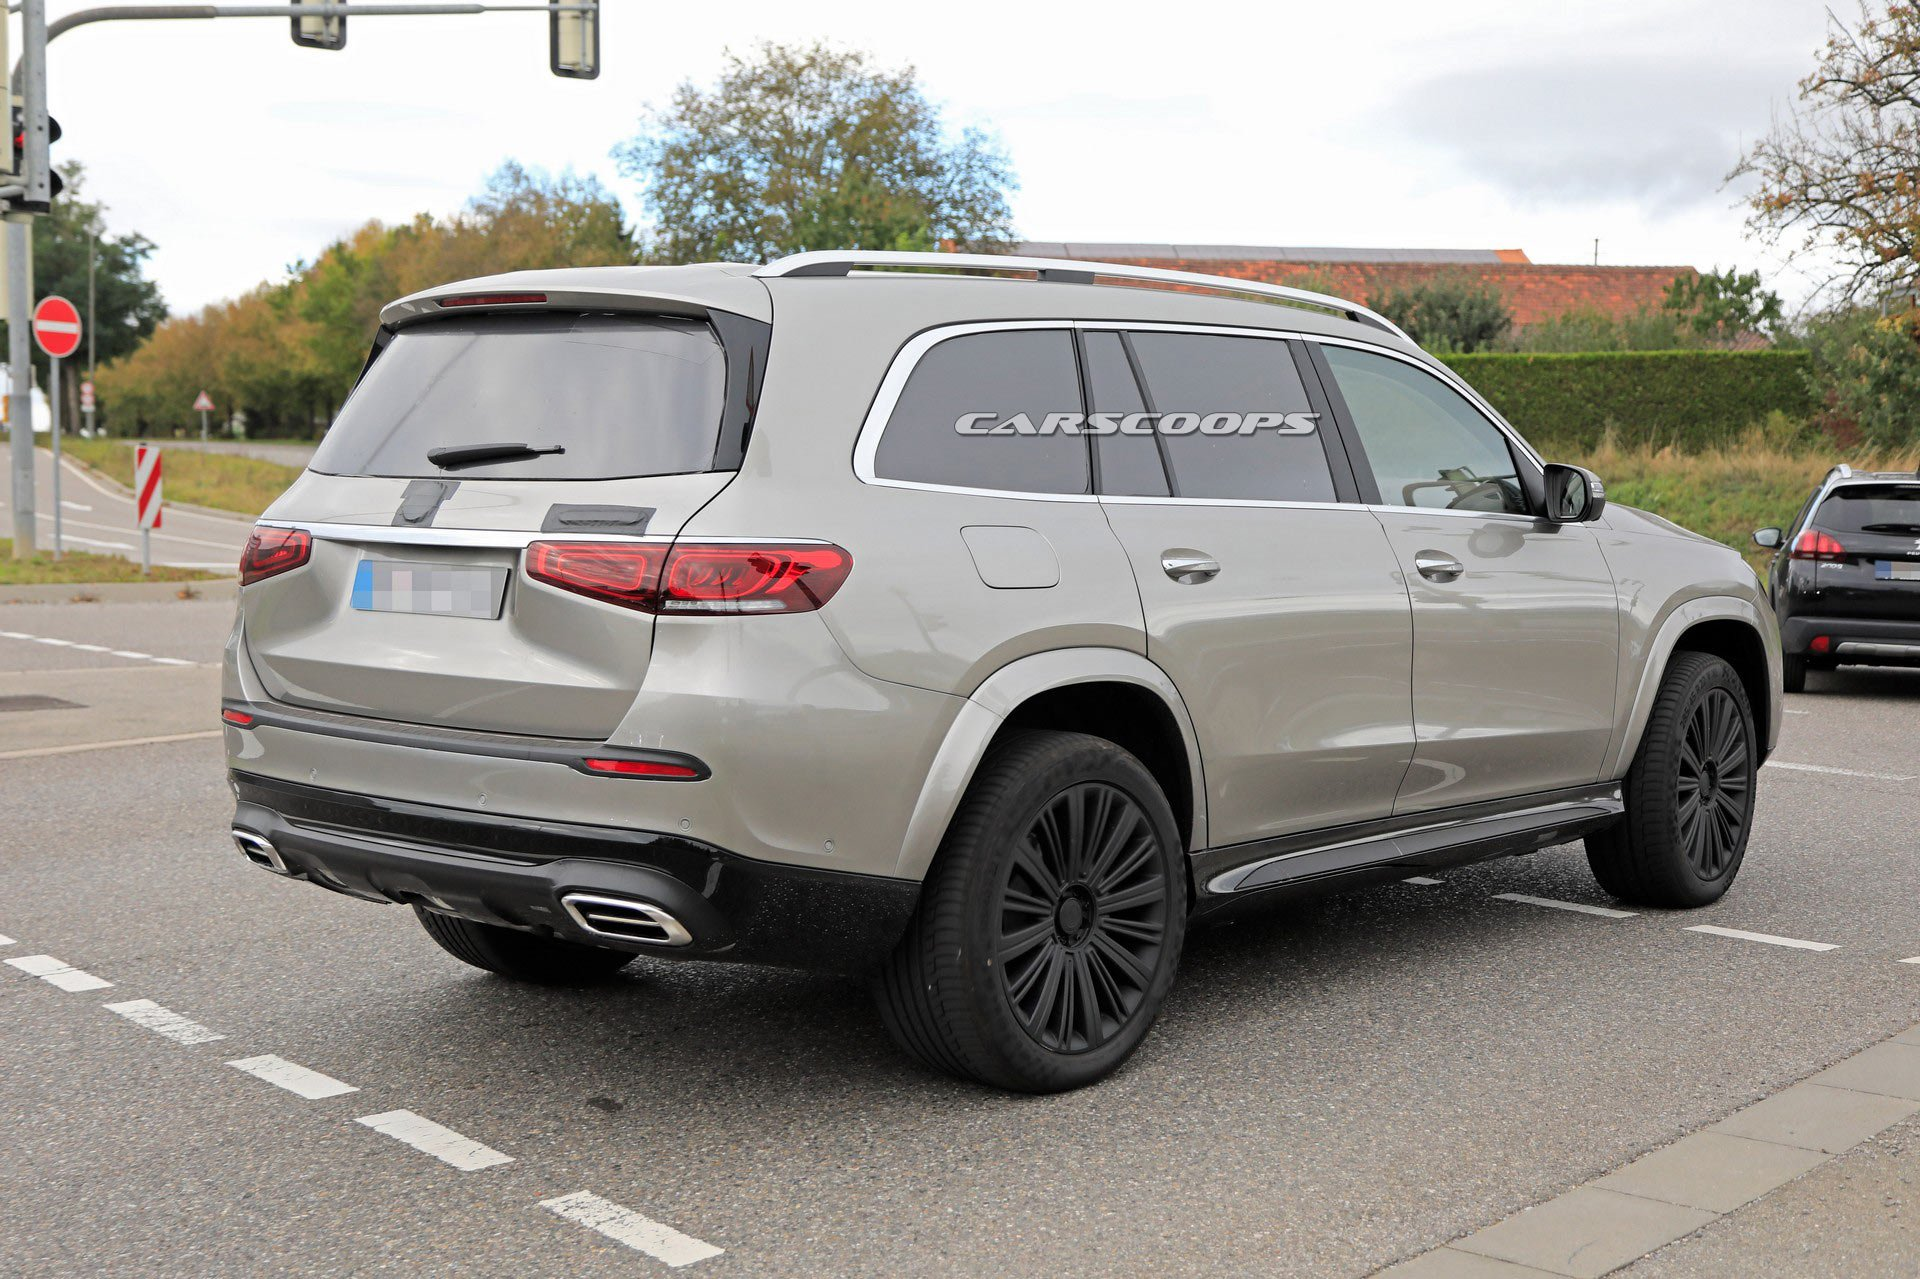 Range Rover Killer Mercedes Maybach Gls Spied Virtually Undisguised Mercedesblog